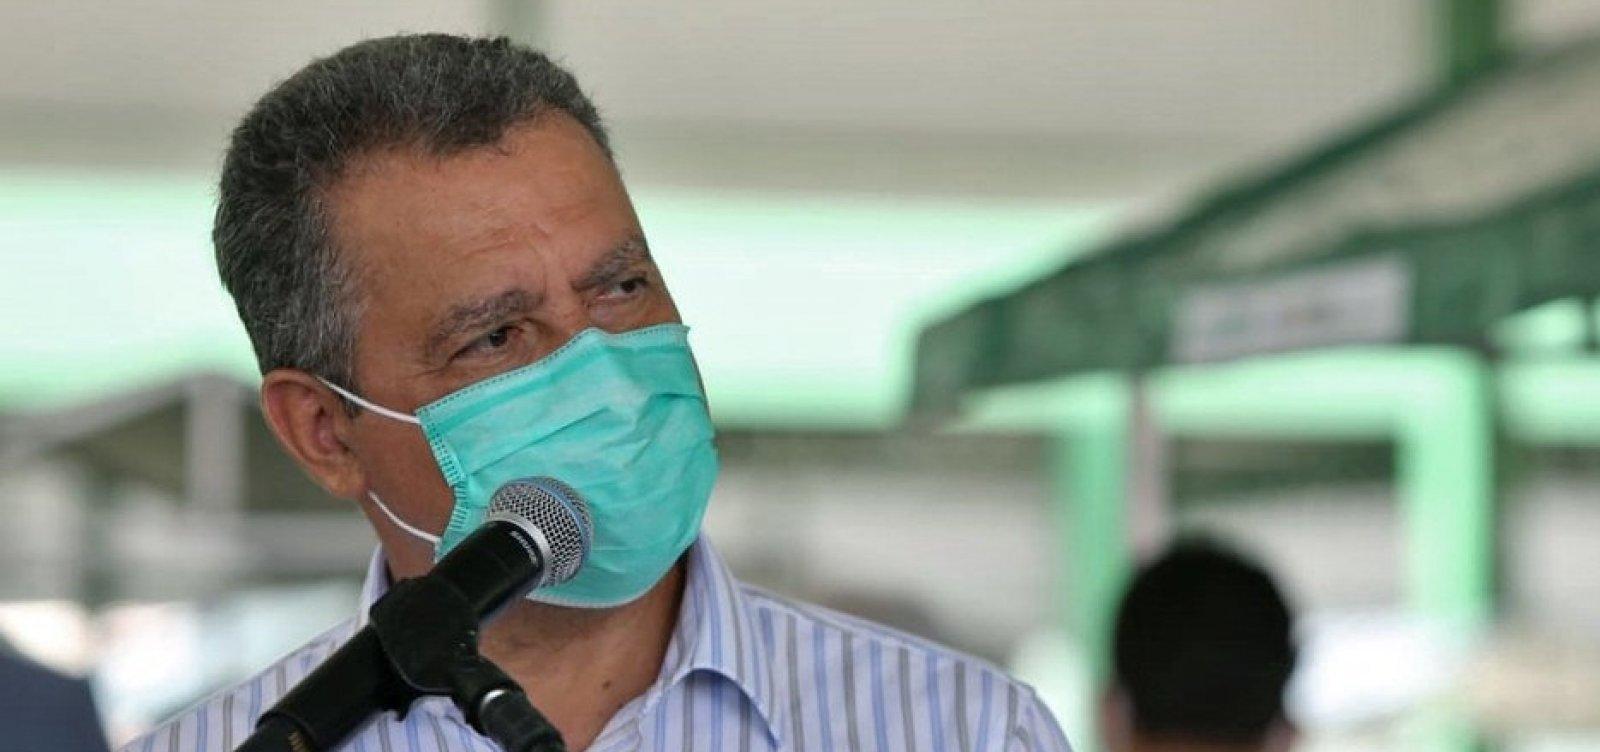 [Bahia corre risco de ter colapso no sistema de saúde, afirma Rui Costa ]